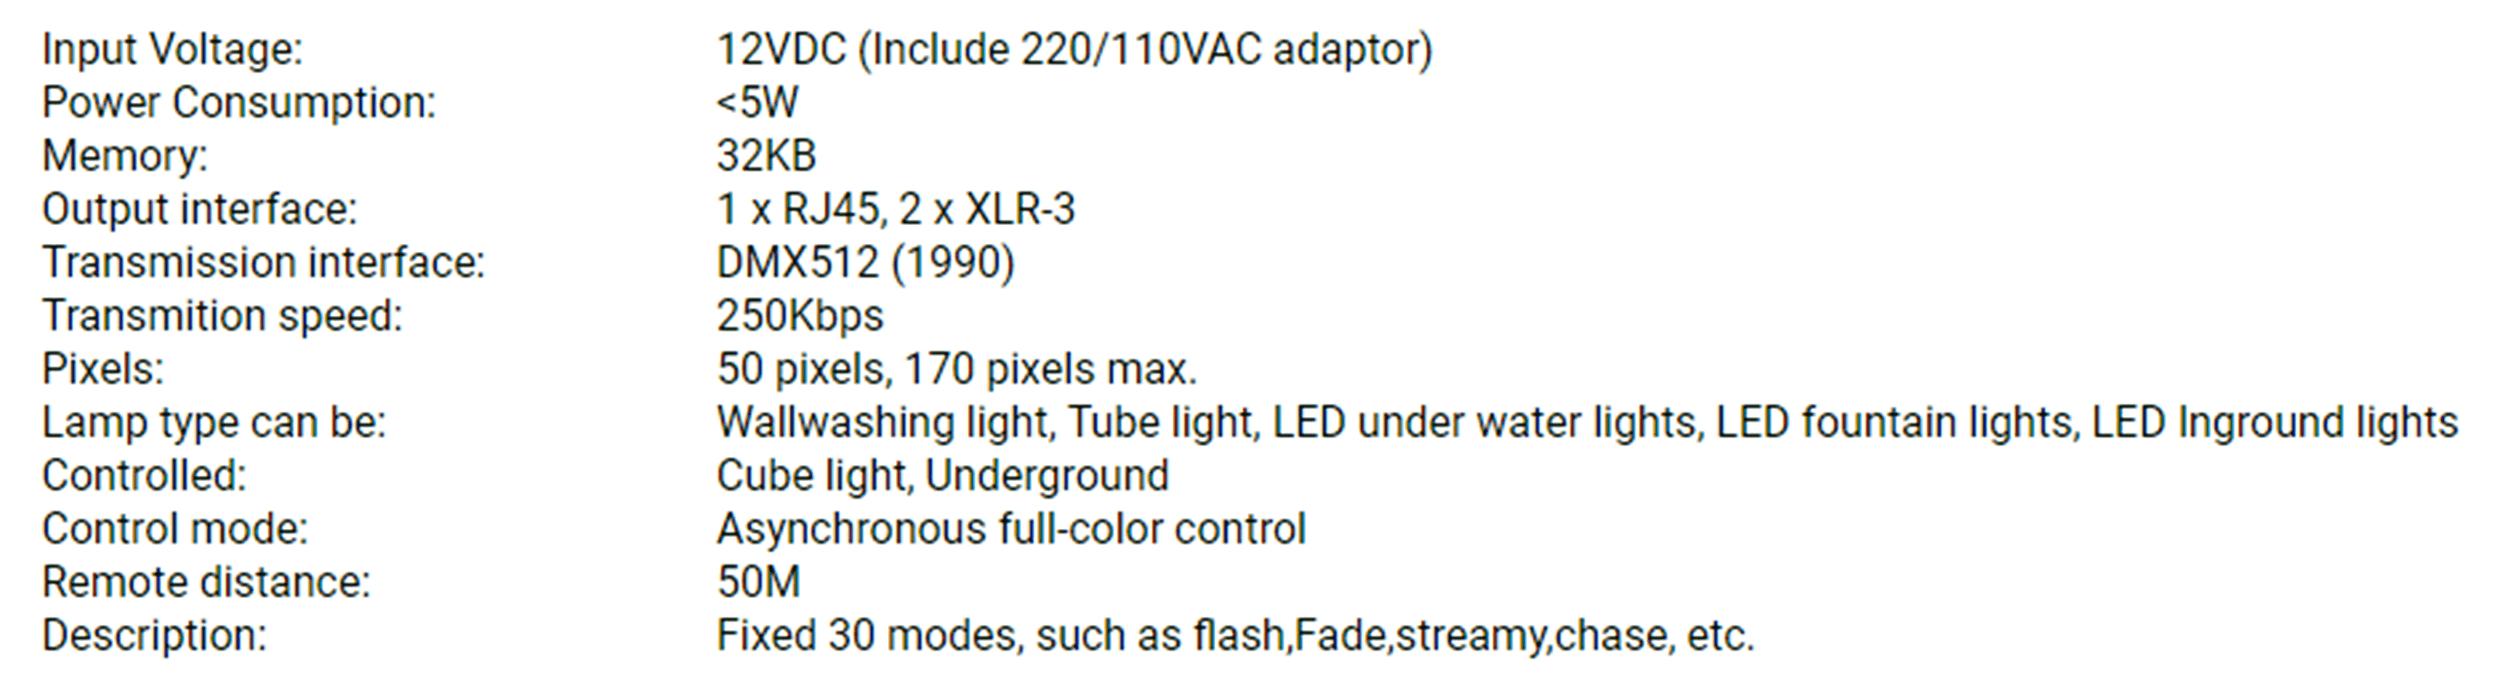 technical-dmx500